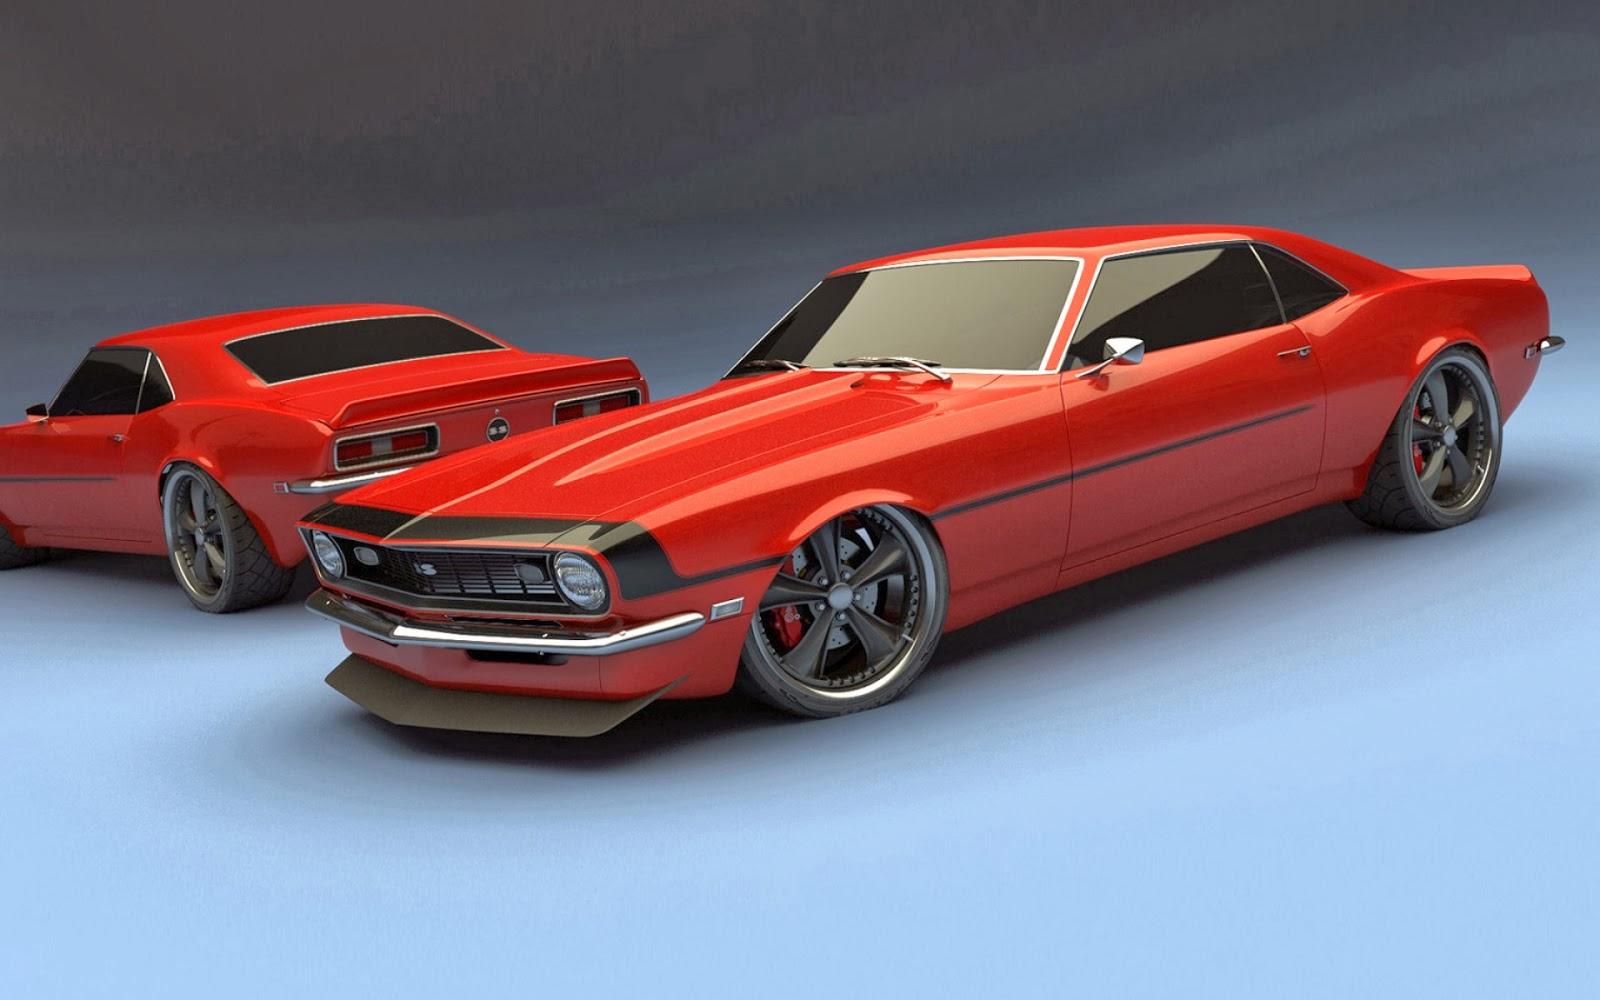 Cars Camaro Car Muscle Chevrolet Concept Wallpaper 1600x1000